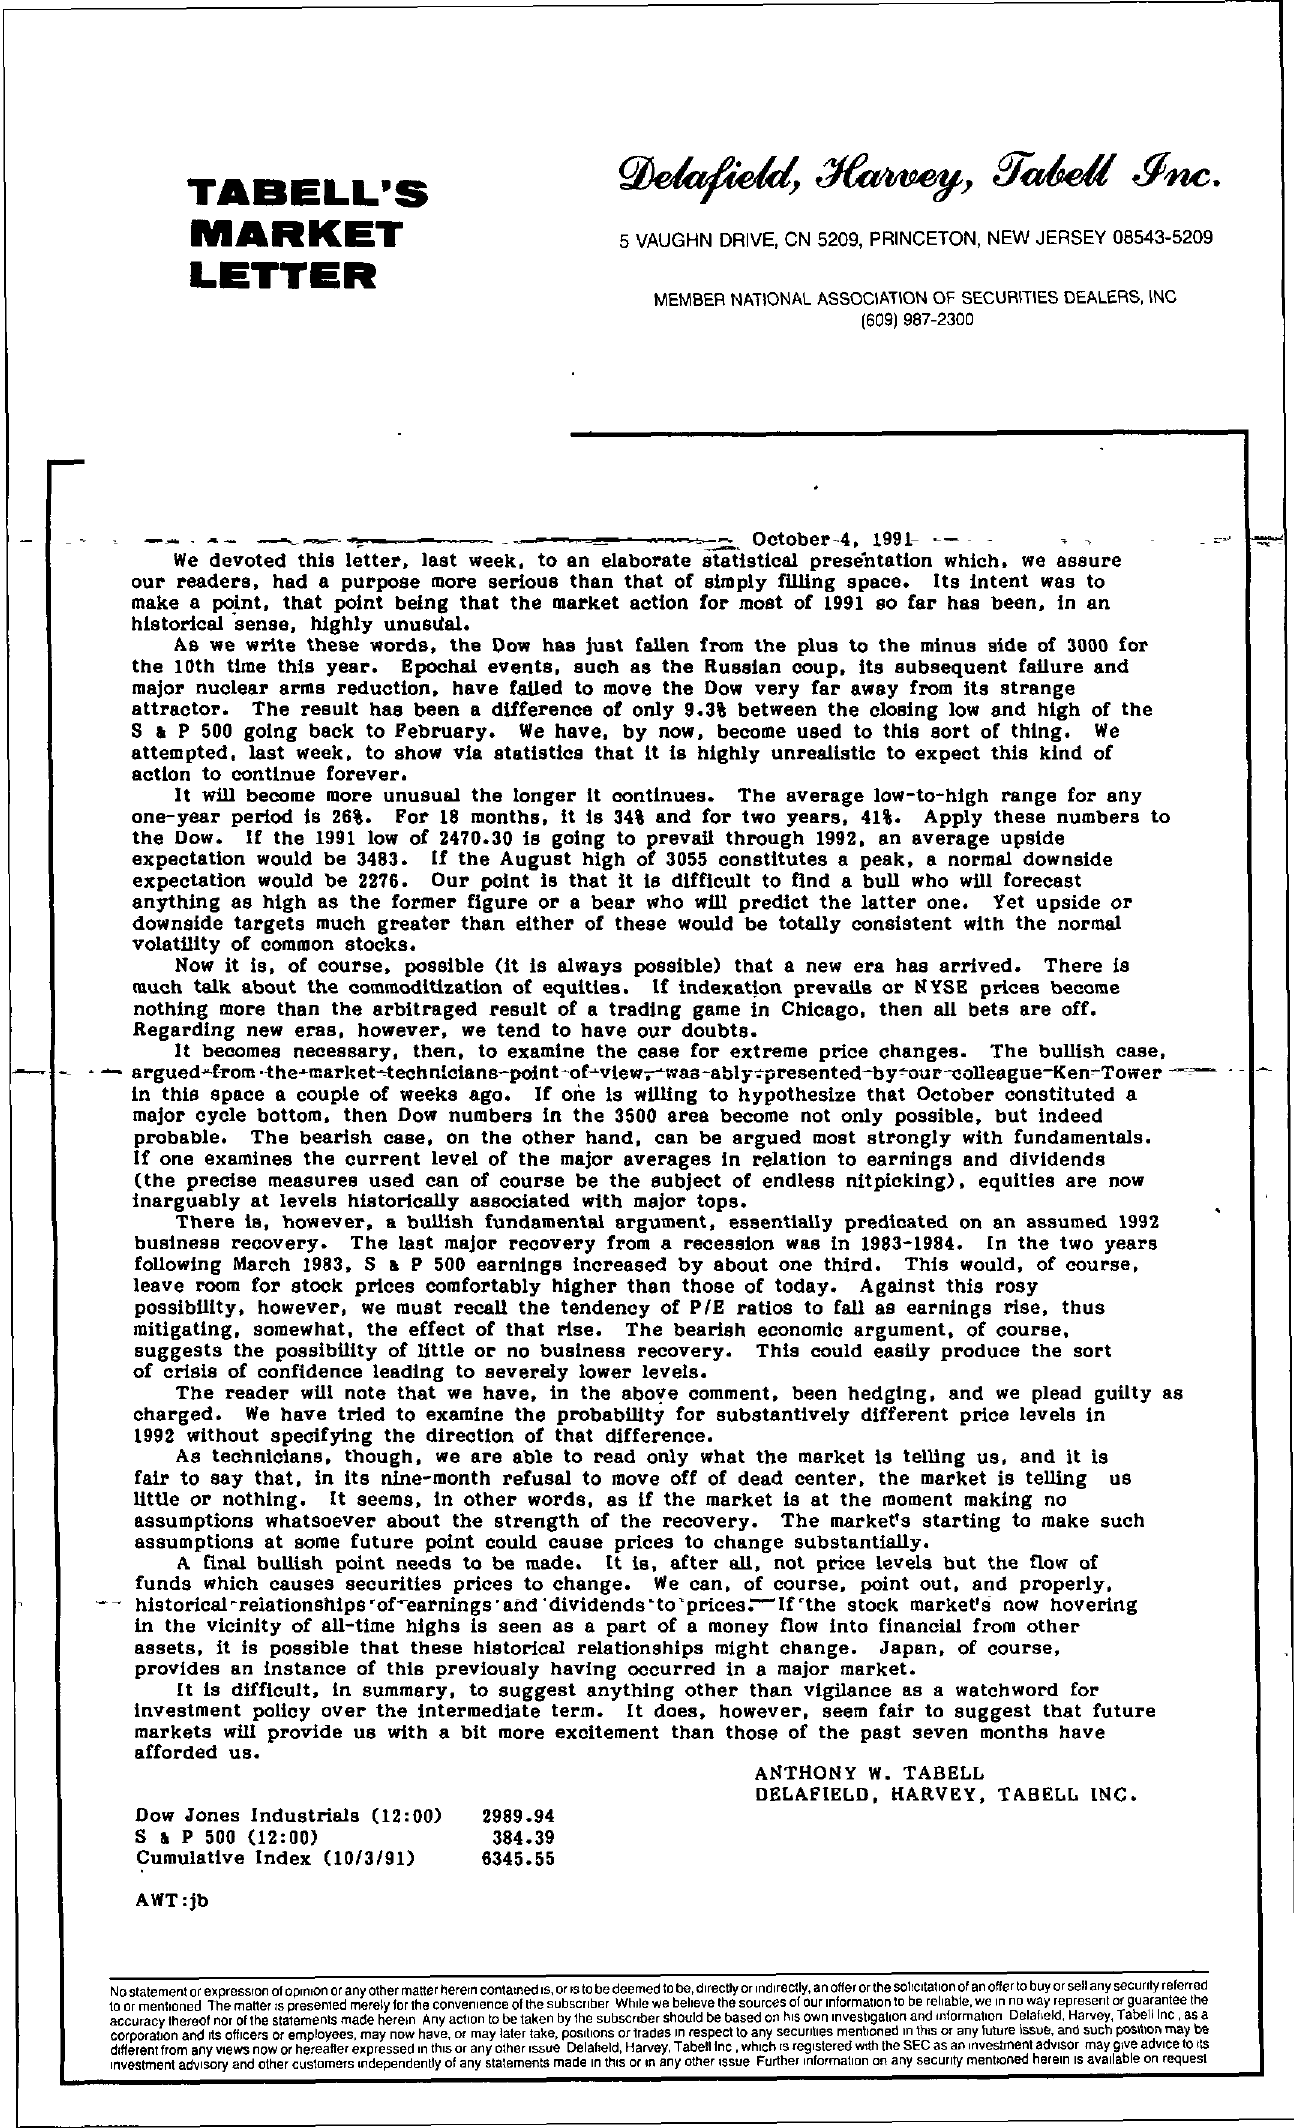 Tabell's Market Letter - October 04, 1991